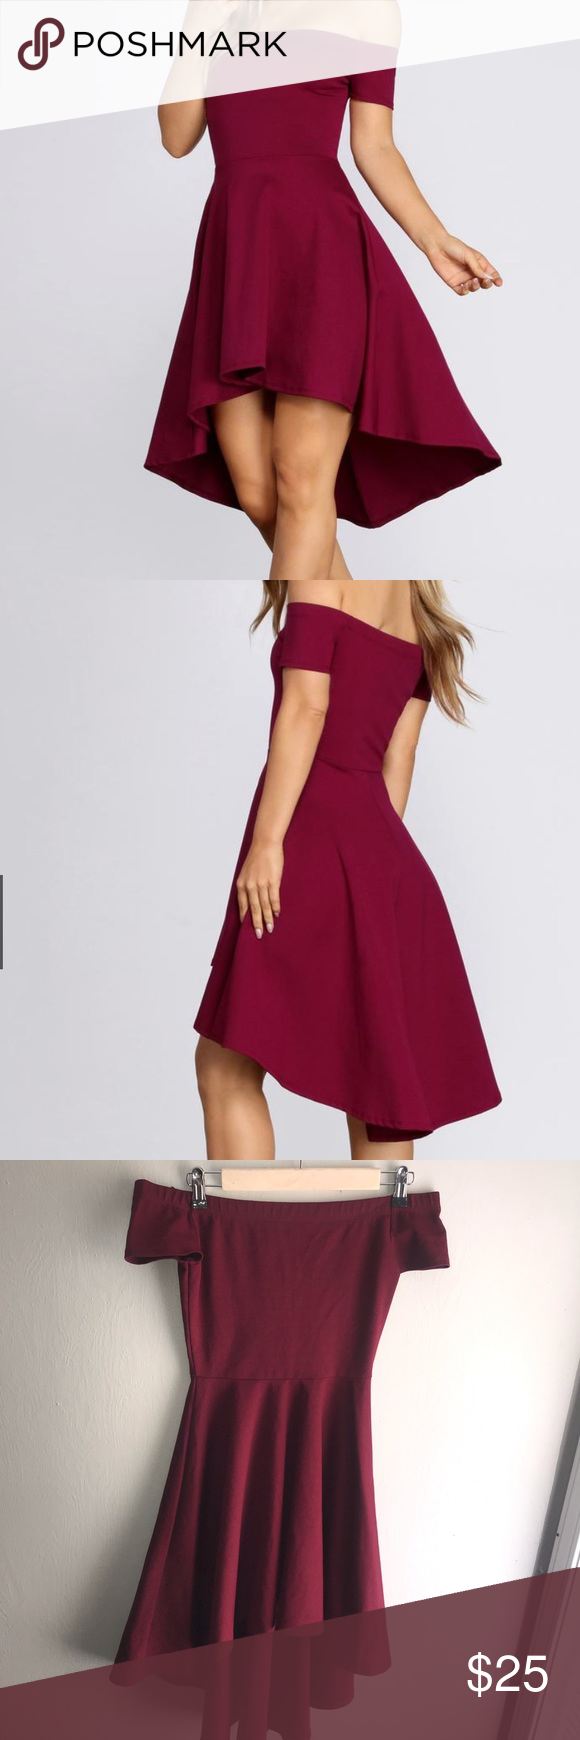 Maroon off-shoulder hoge-laag skaterjurk Deze jurk is een hoog-laag ontwerp met …